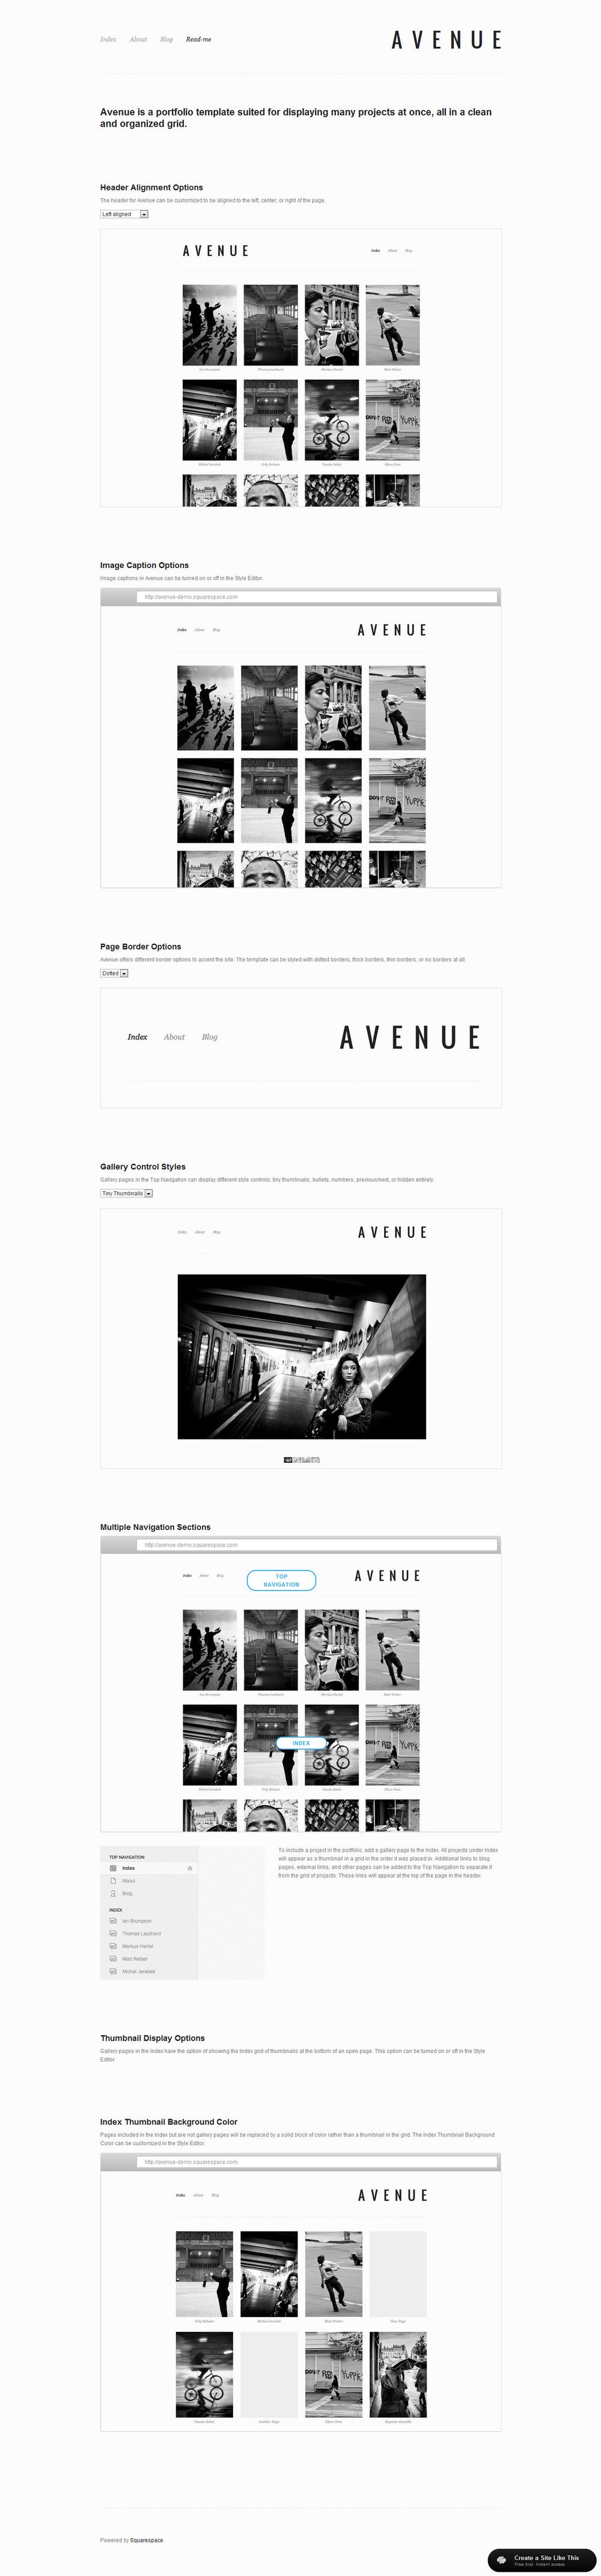 avenue read. Black Bedroom Furniture Sets. Home Design Ideas